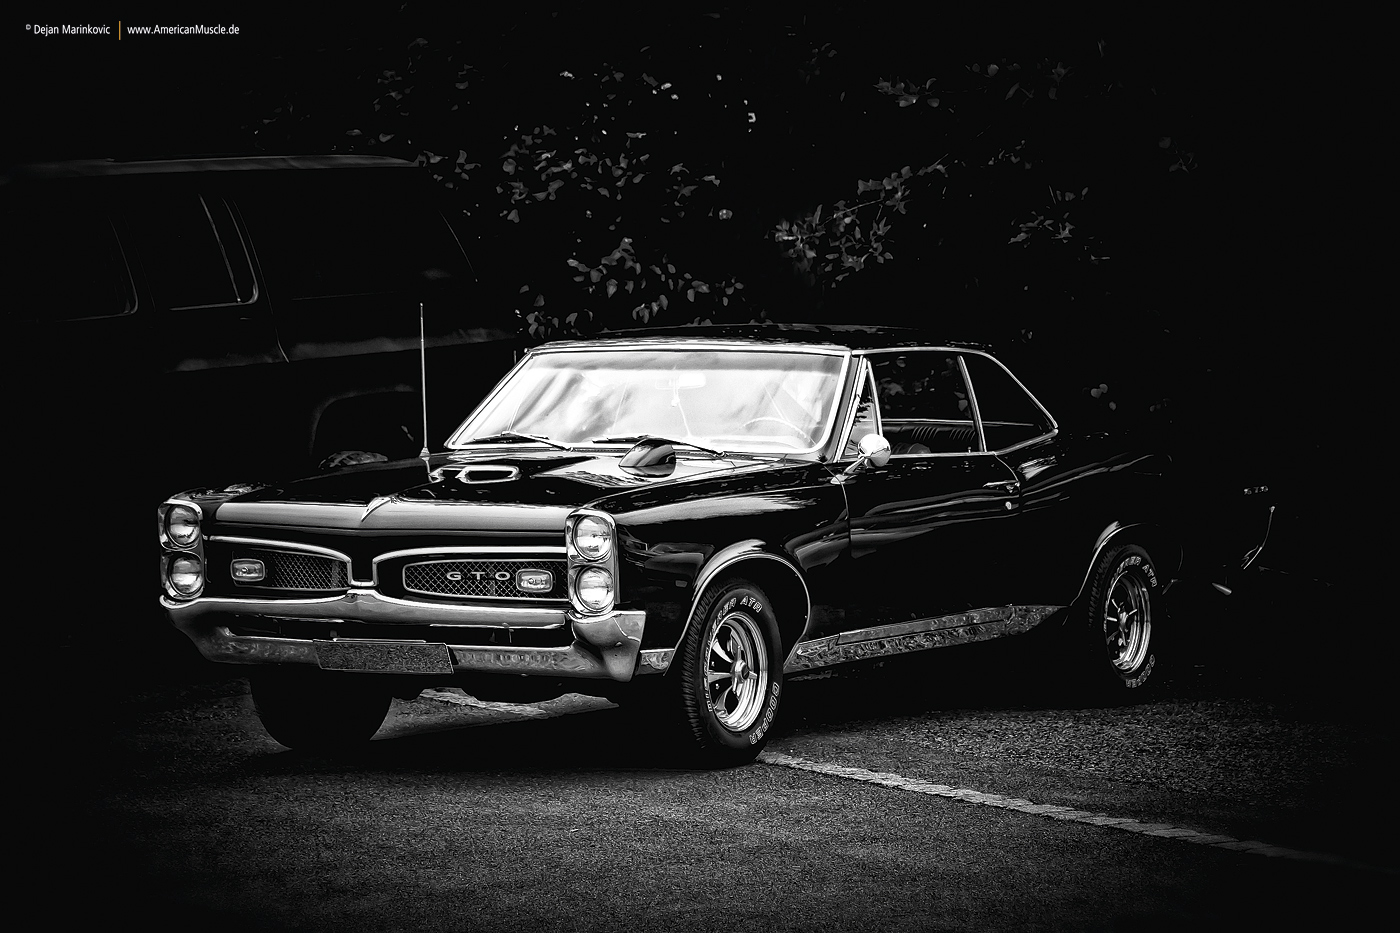 1967 Pontiac GTO BlackWhite by AmericanMuscle 1400x933